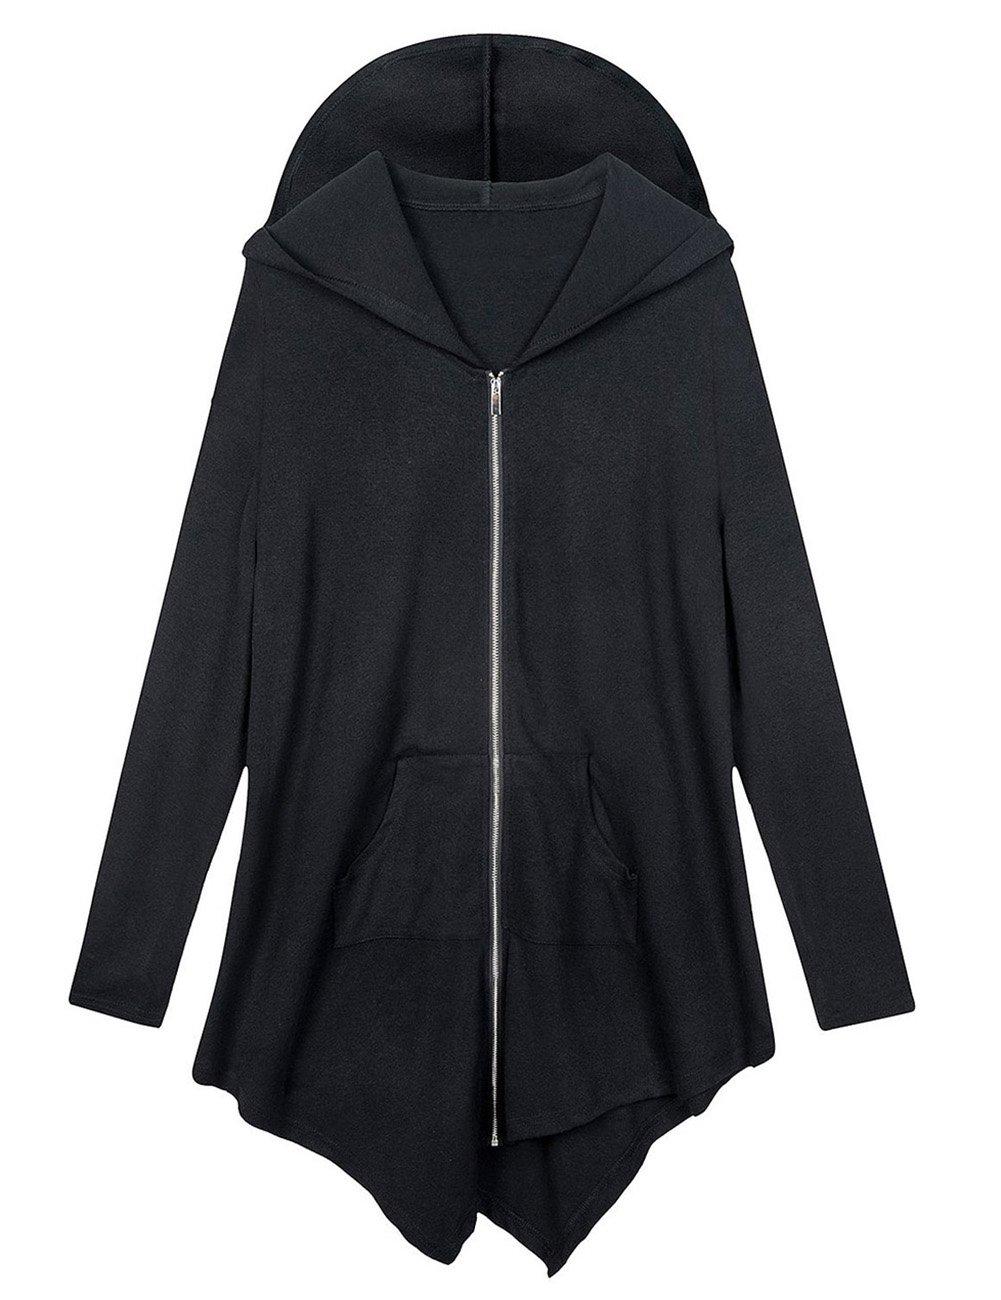 AMZ PLUS Women Plus Size Lightweight Full Zip Up Hooded Sweatshirt Hoodie Jacket Black L